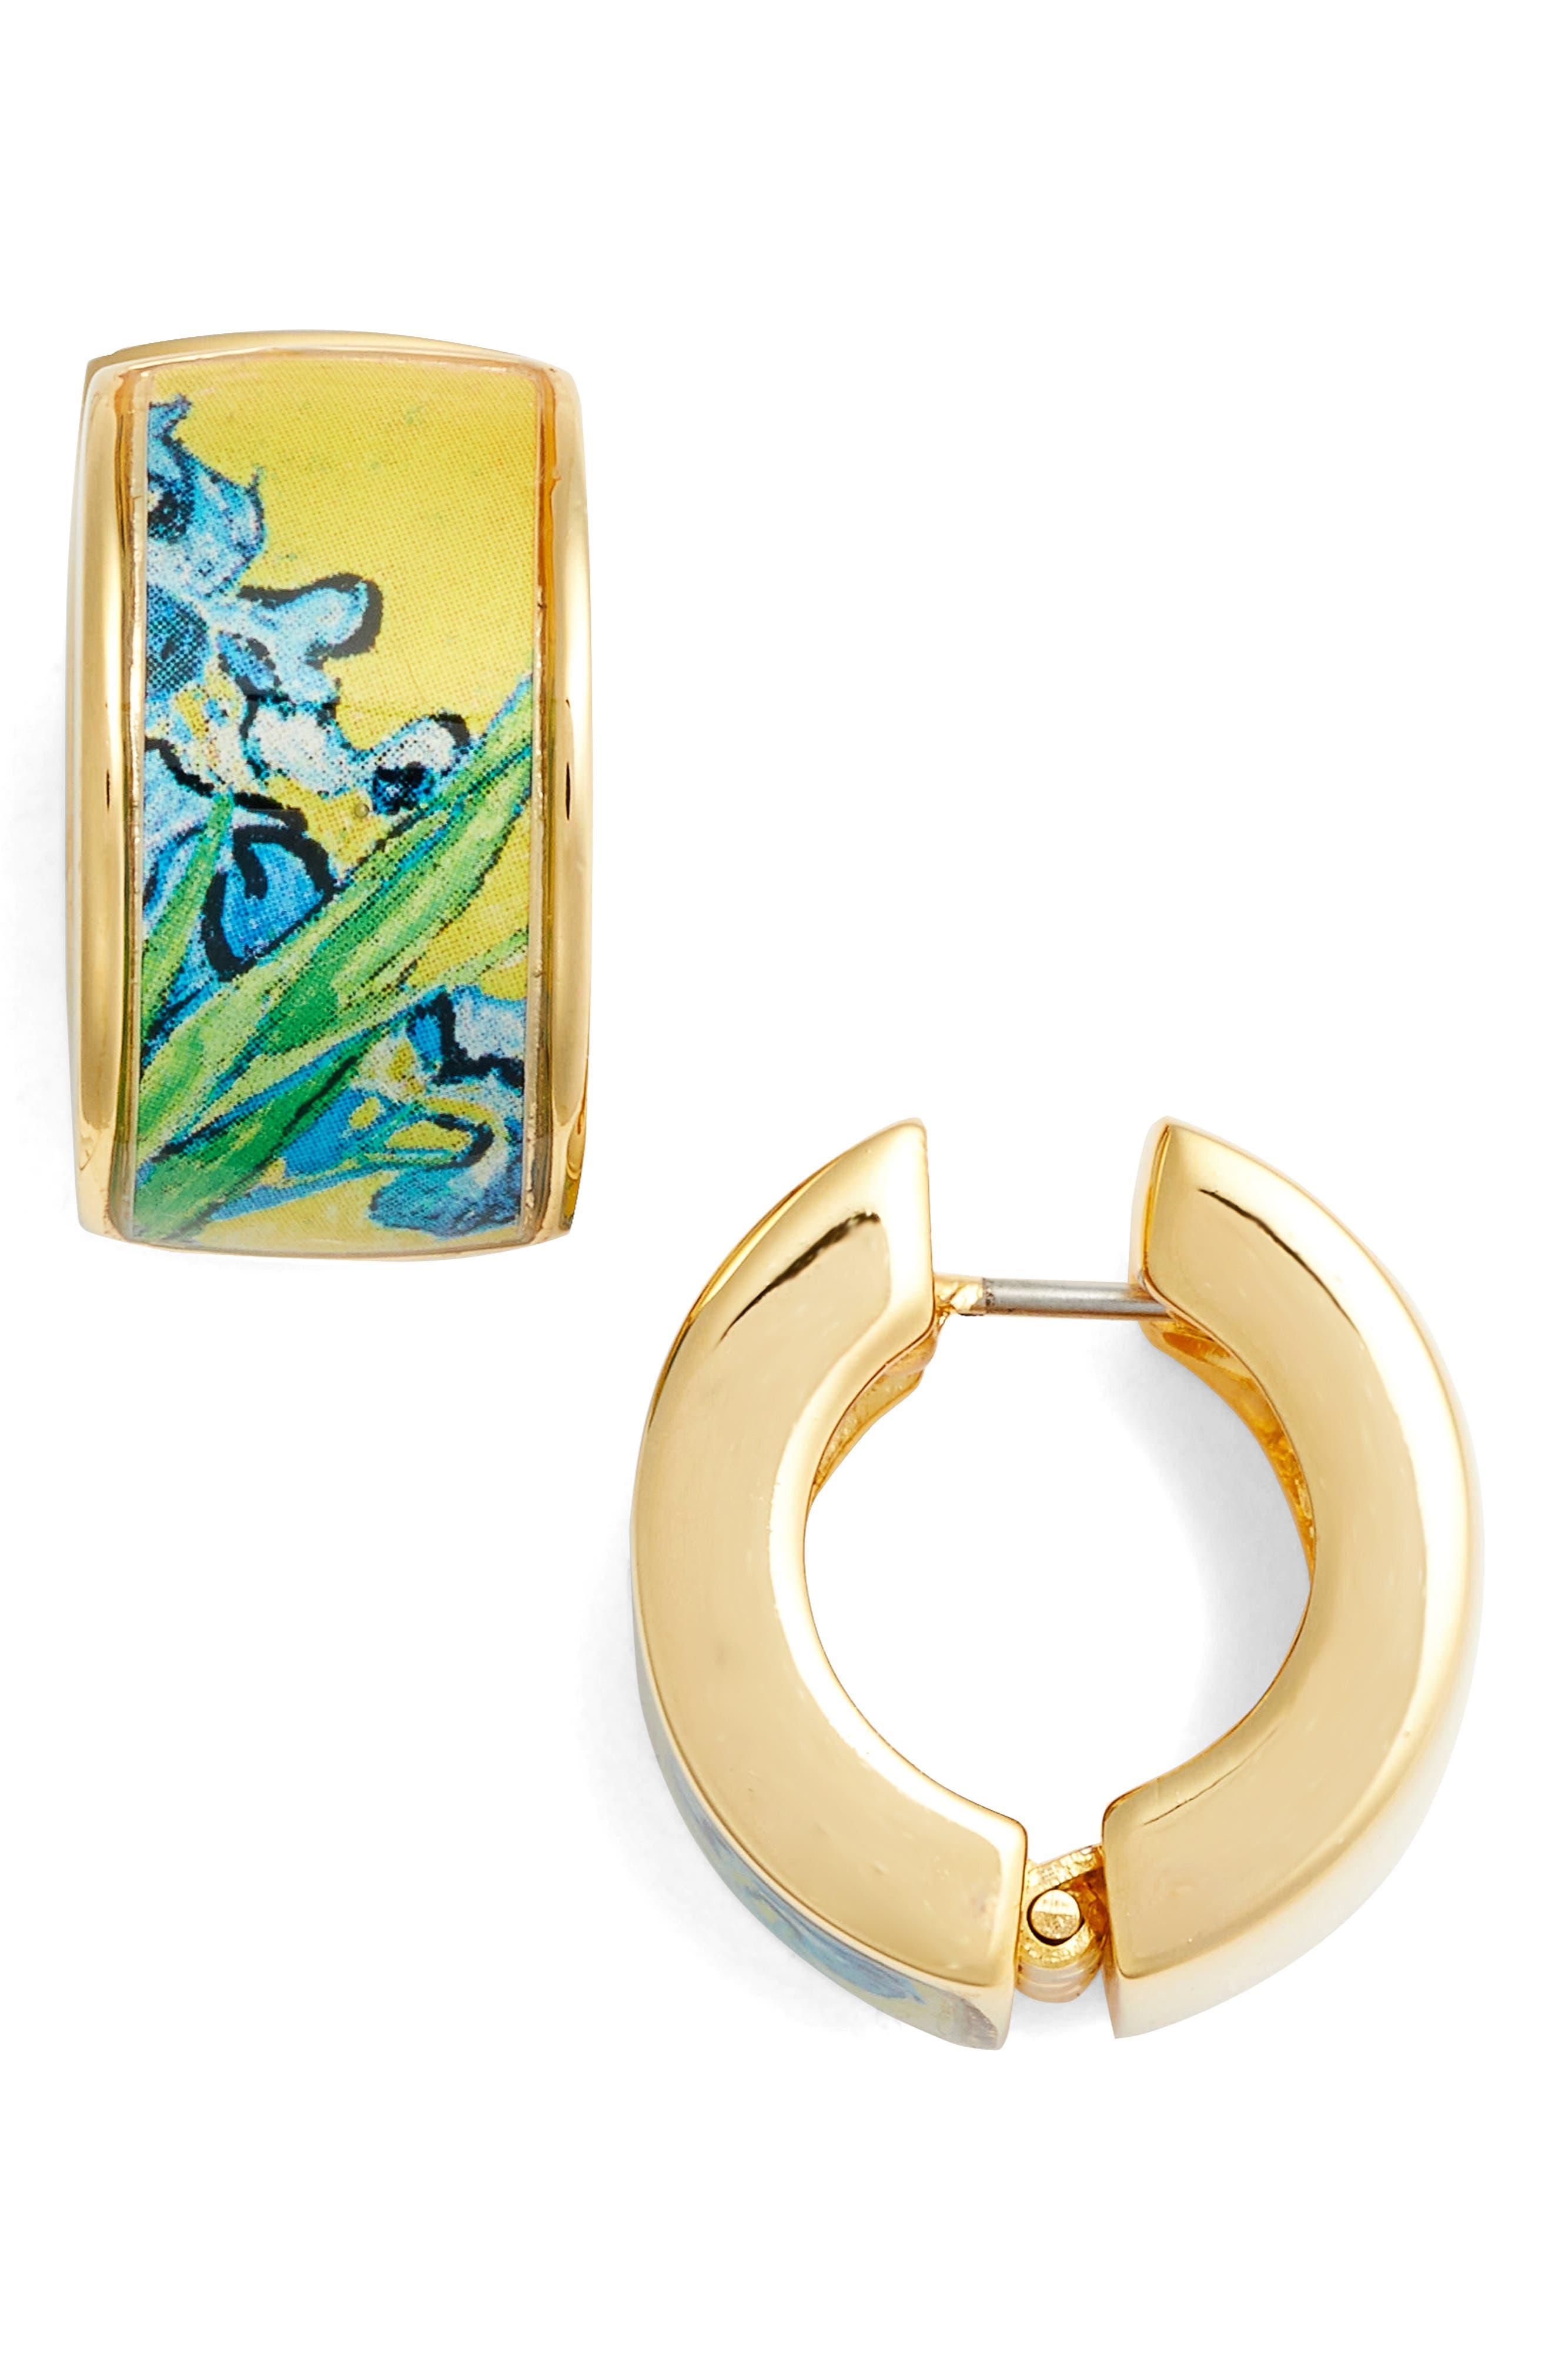 Irises Earrings,                         Main,                         color, Yellow/ Gold